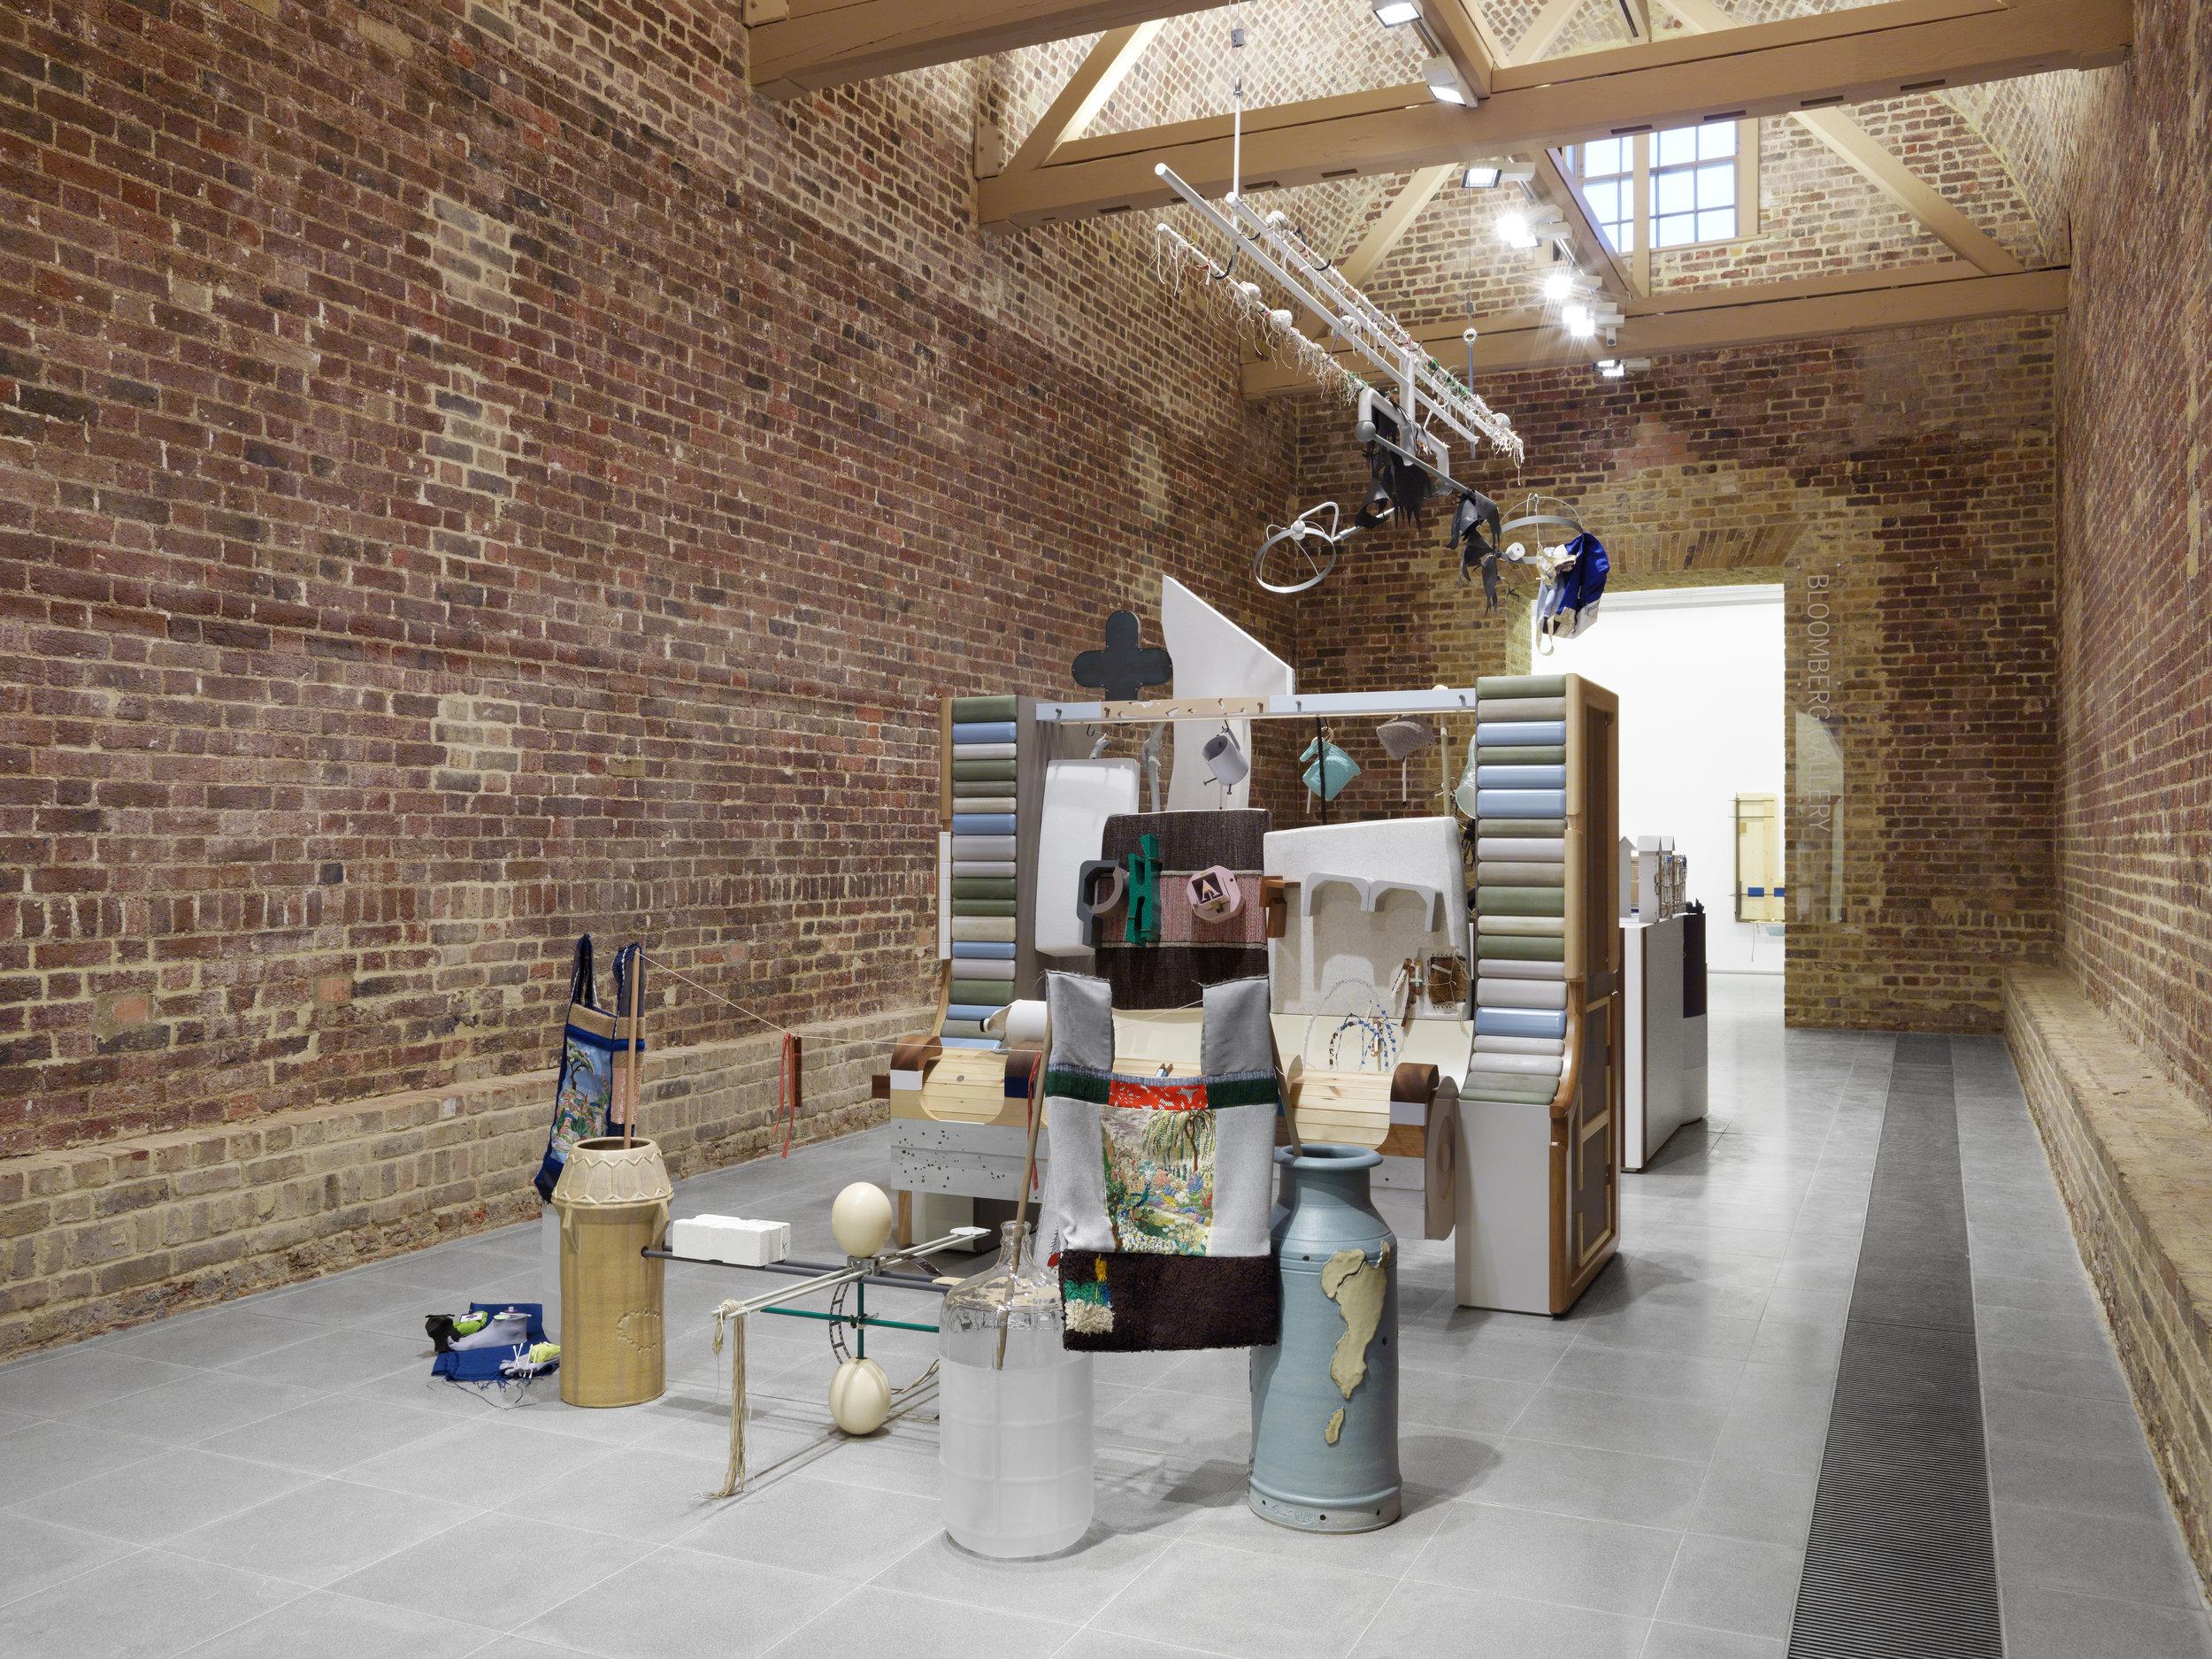 Serpentine London | Helen Marten | 2016